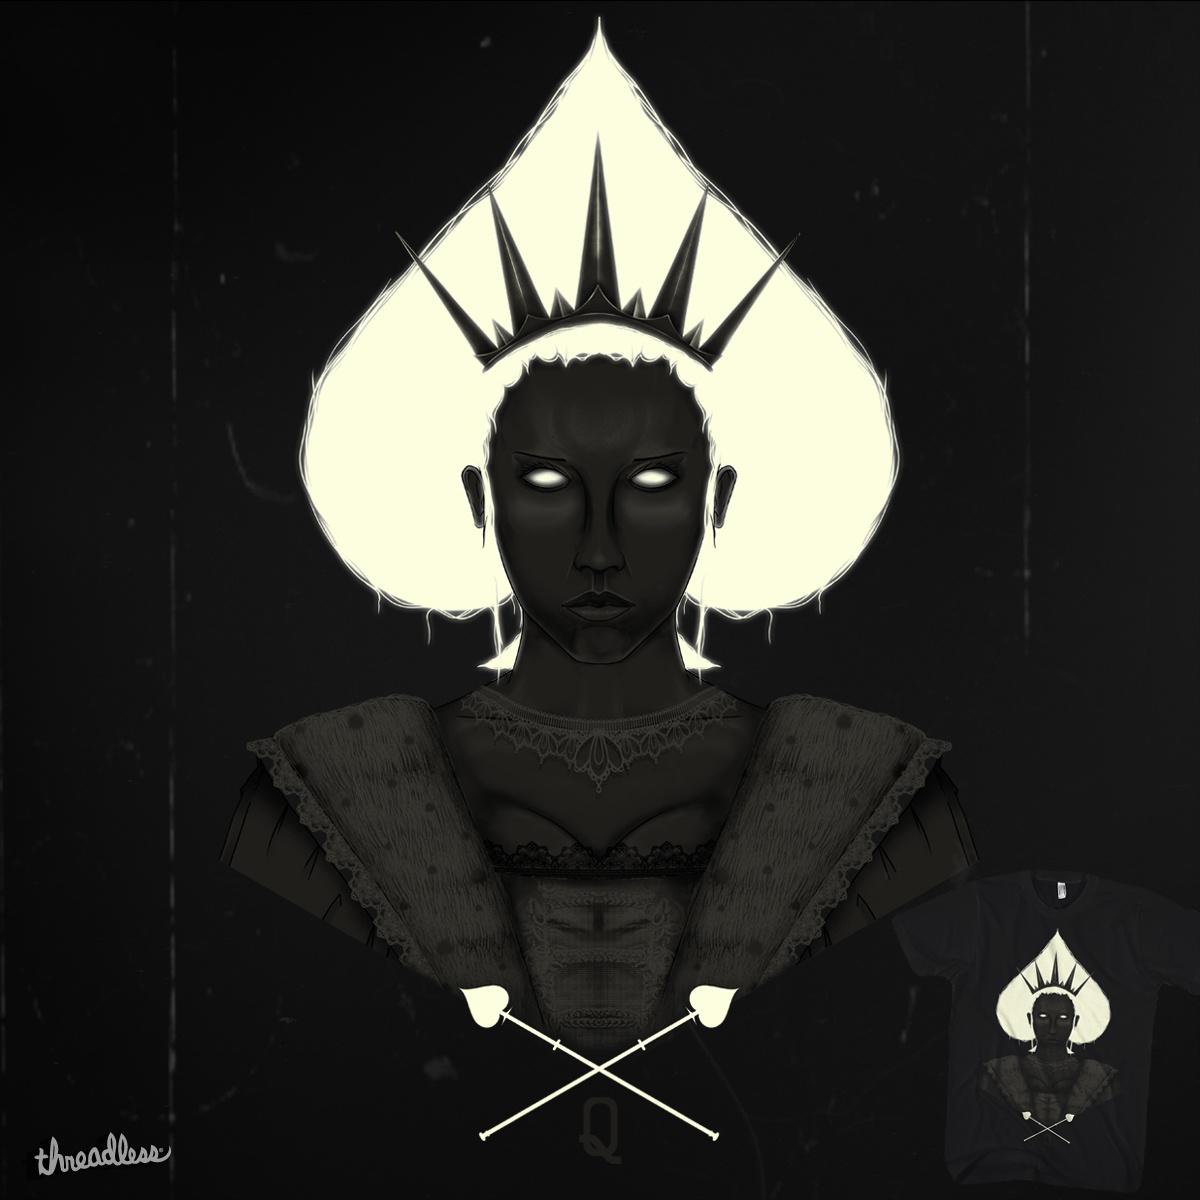 Queen of Spades by sebasebi on Threadless